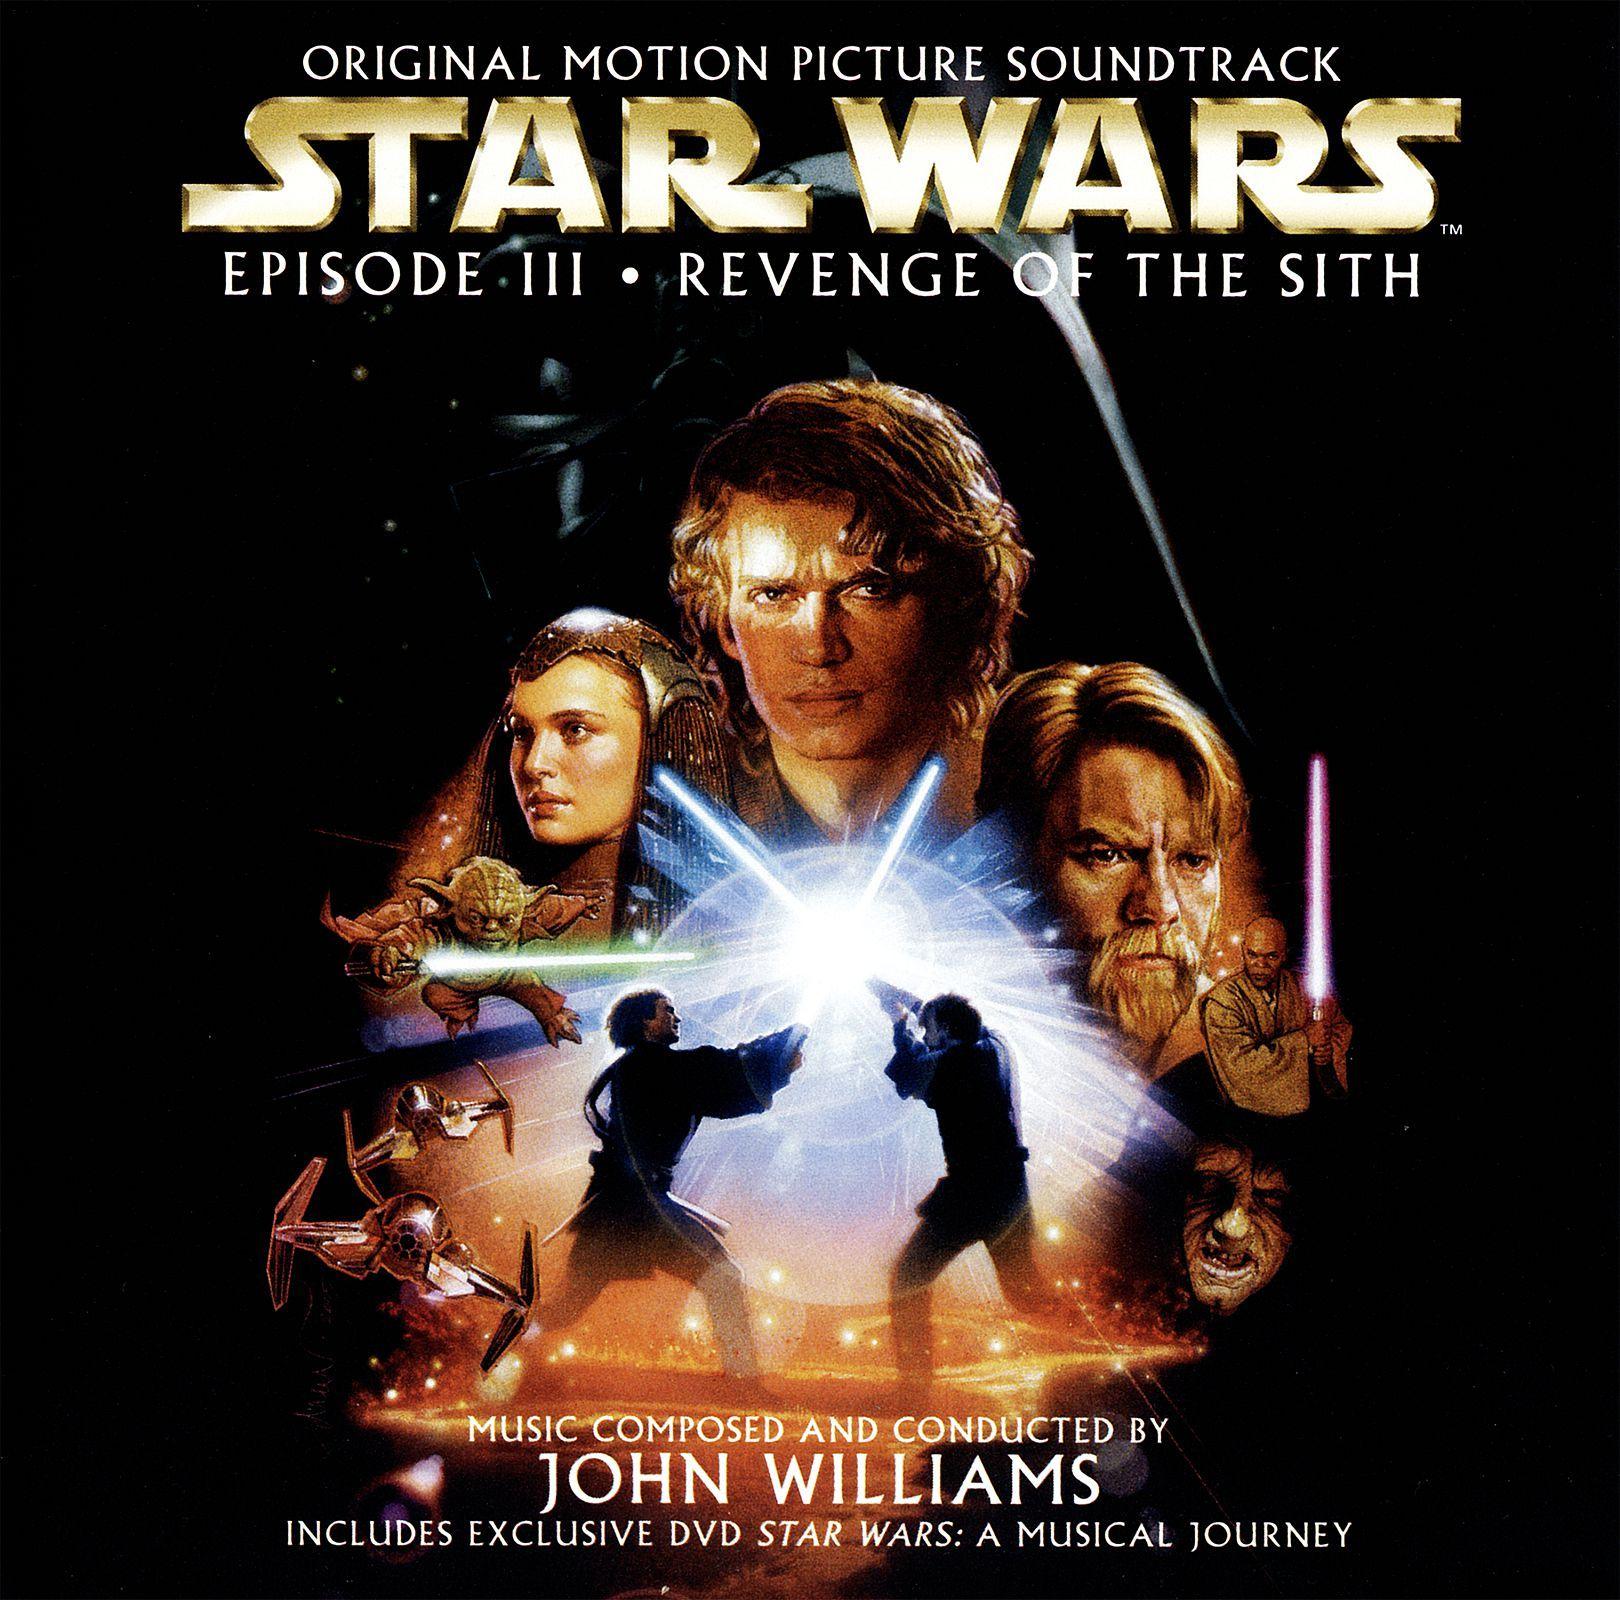 Affiches Posters Et Images De Star Wars Episode Iii 2005